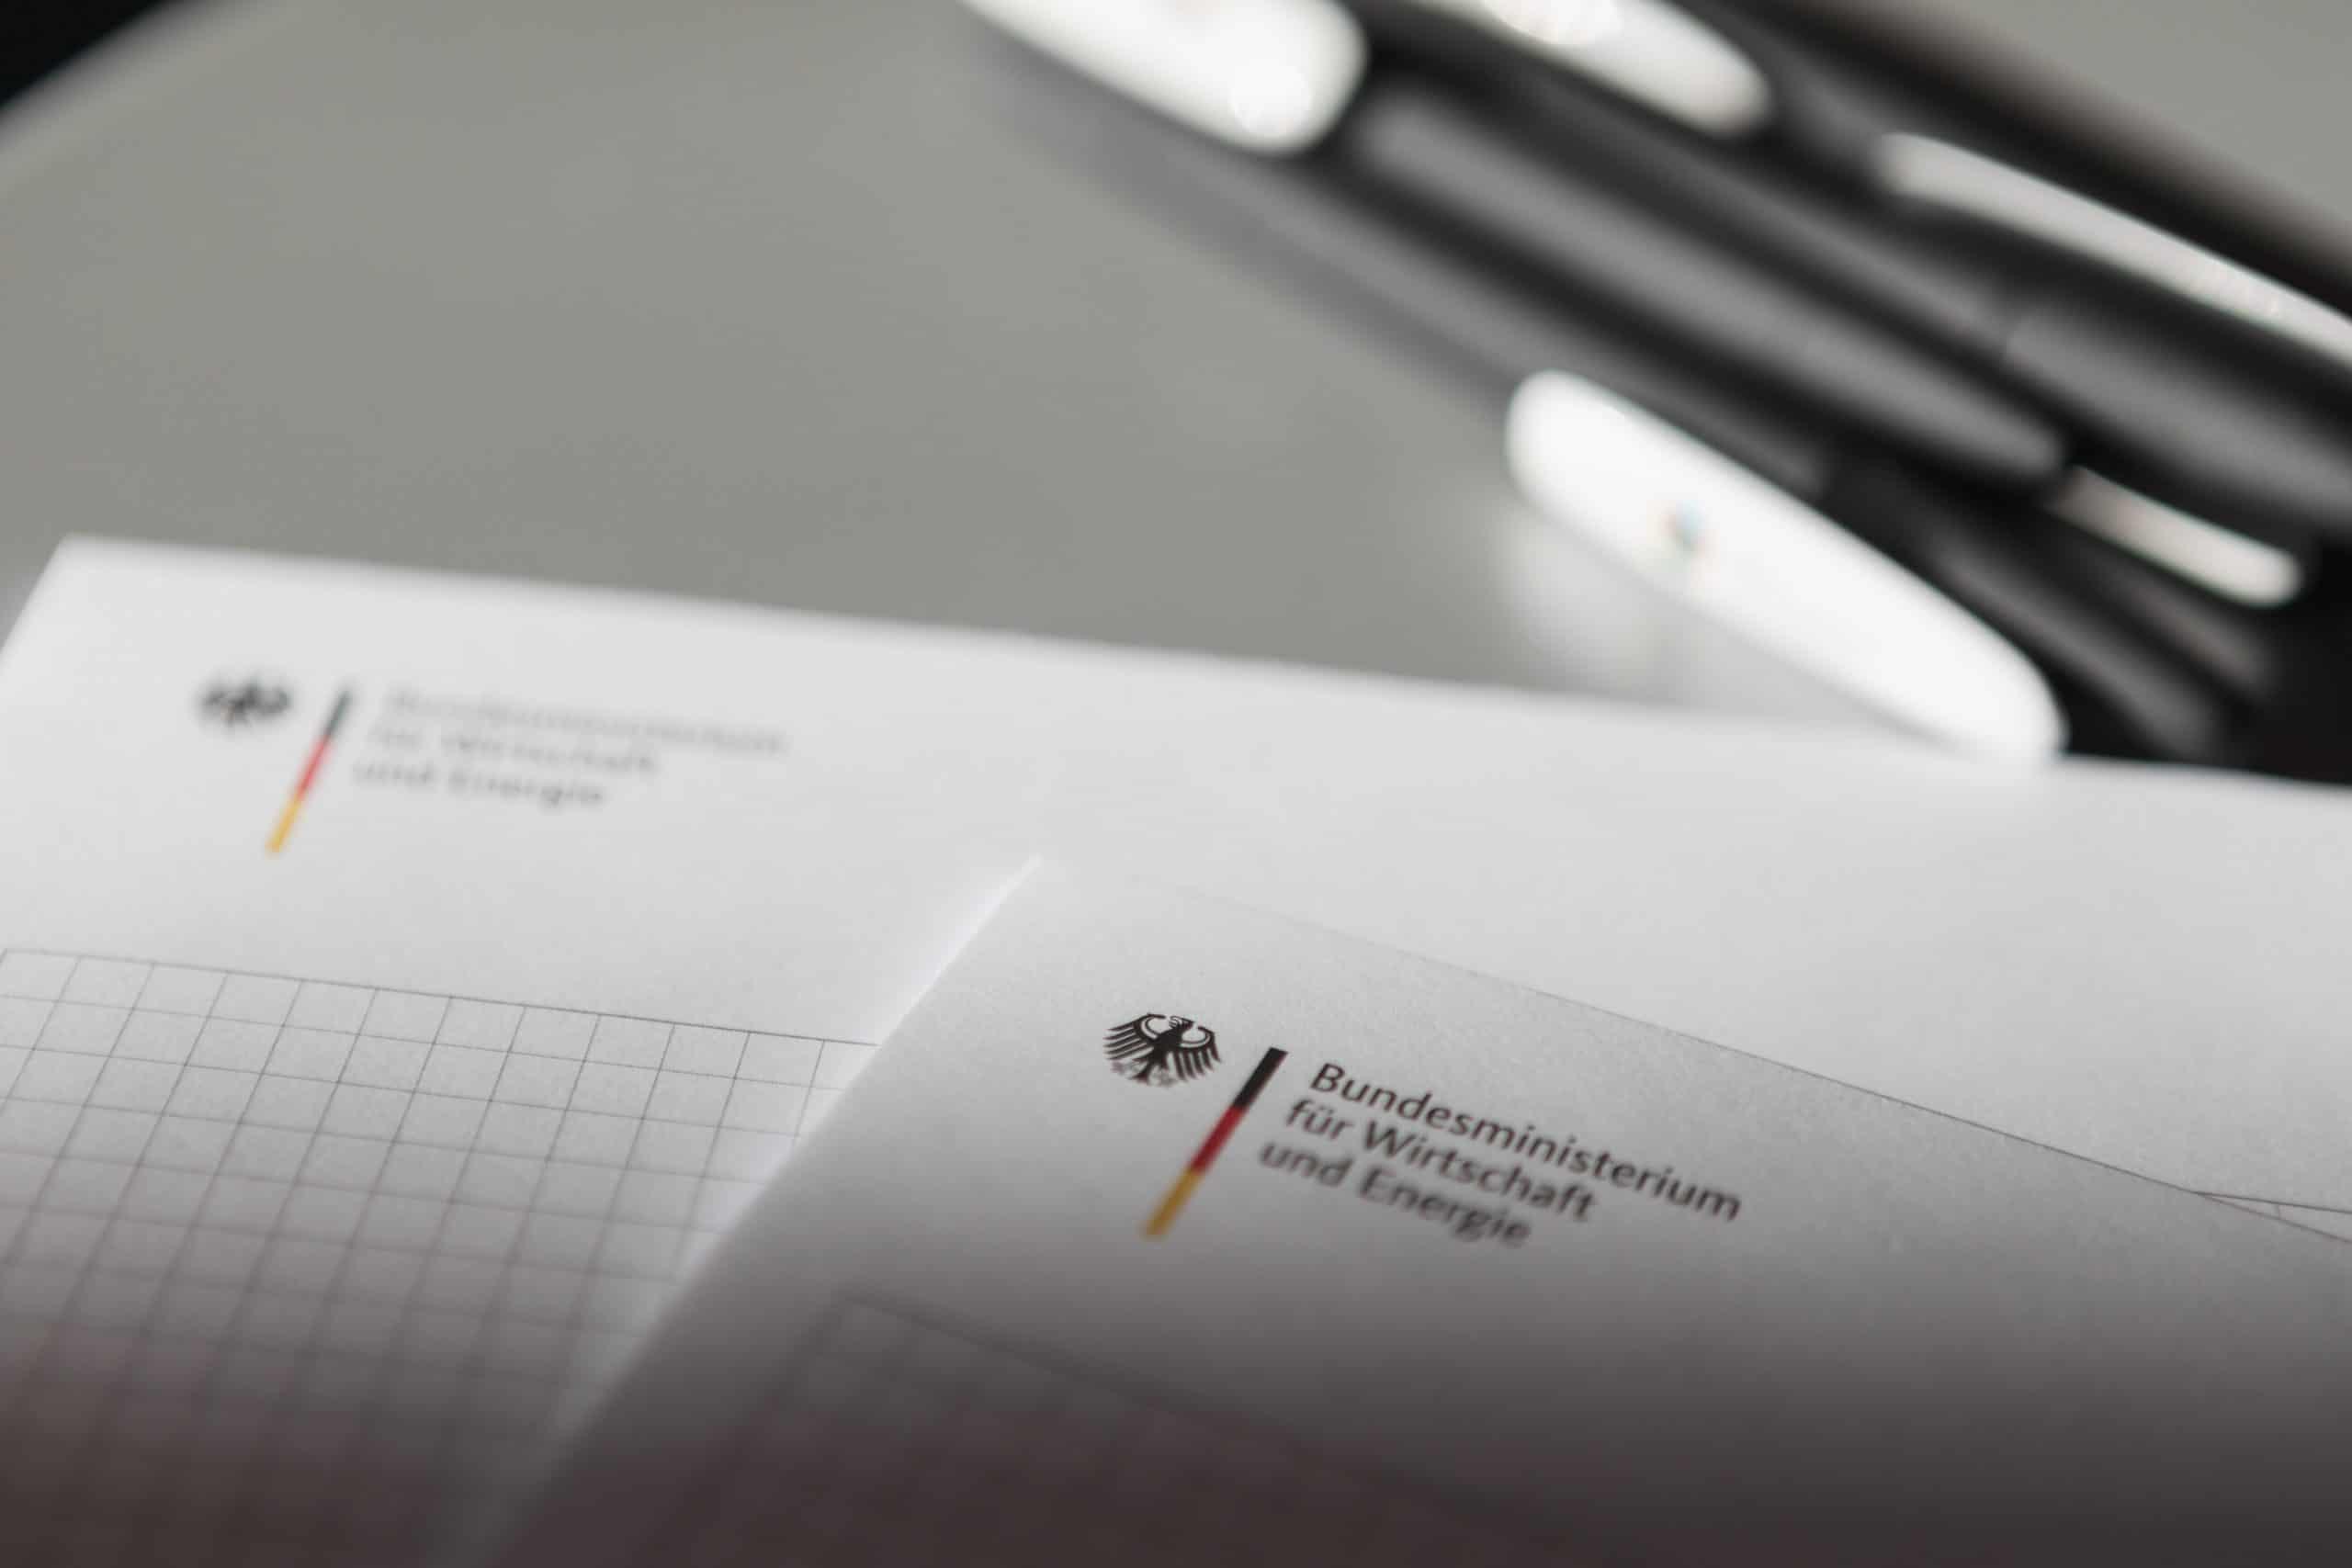 Internationale Fachkonferenz, Kreative Wirkungskraft | BMWi, Berlin – 30.10.2018